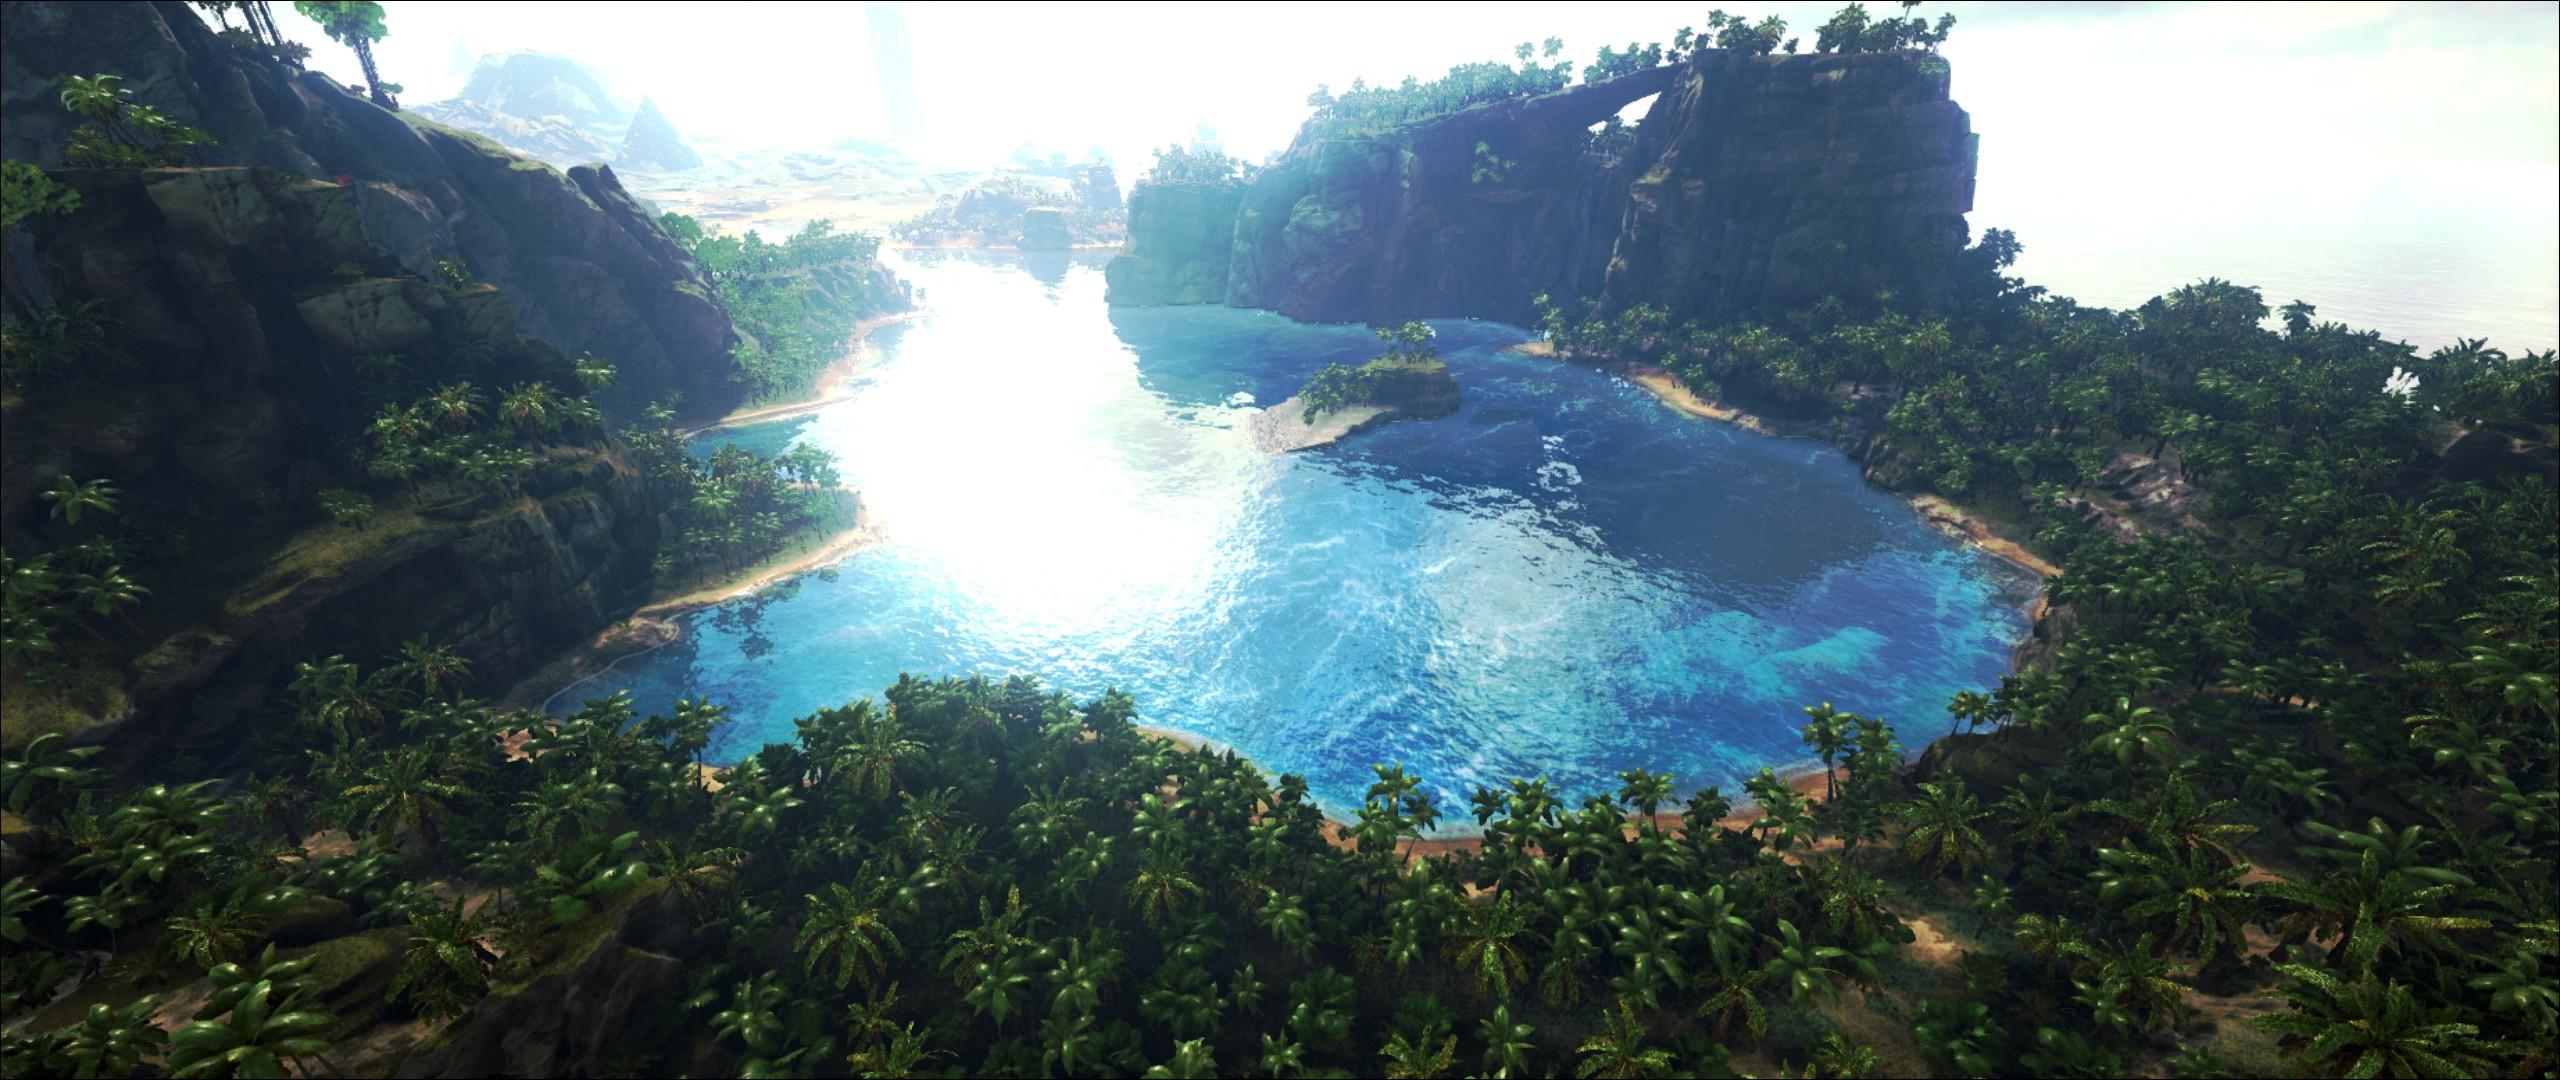 Video Game – ARK: Survival Evolved Lake Jungle Wallpaper